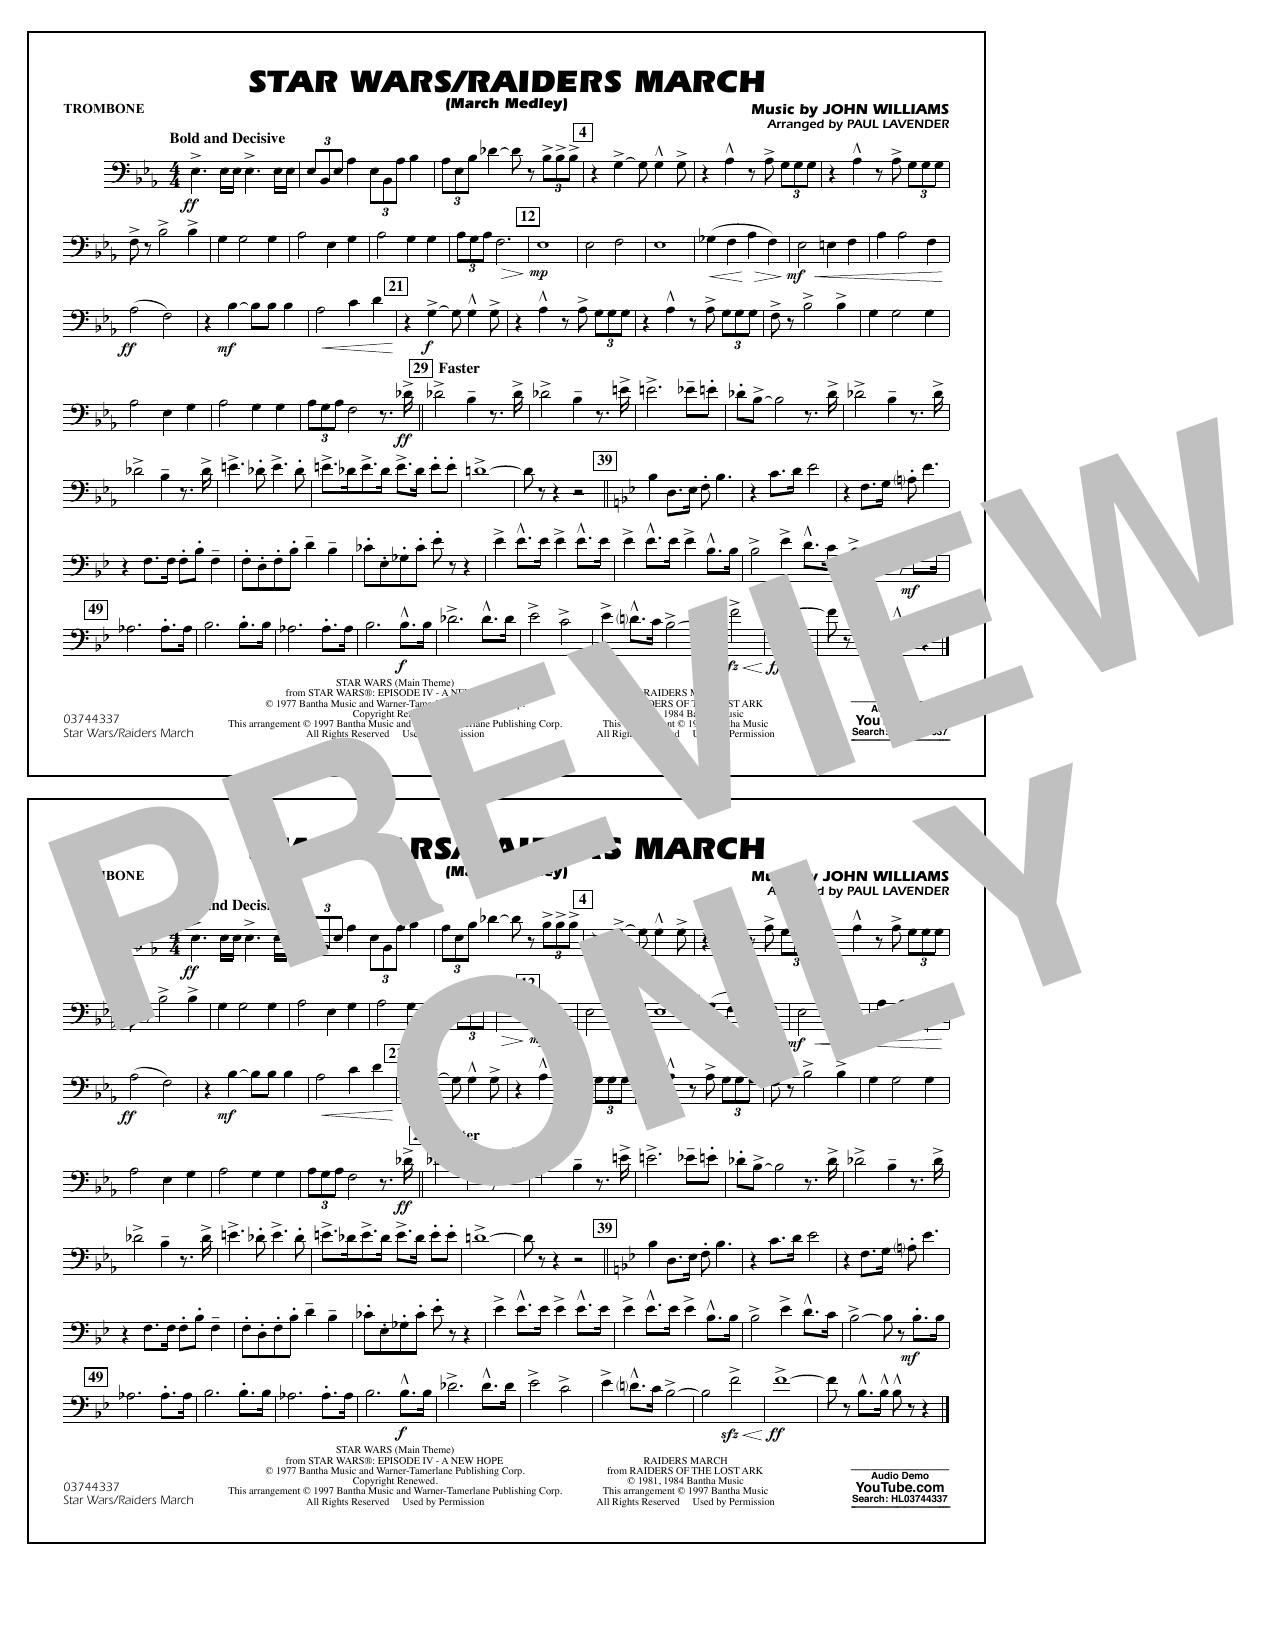 Star Wars/Raiders March - Trombone Sheet Music